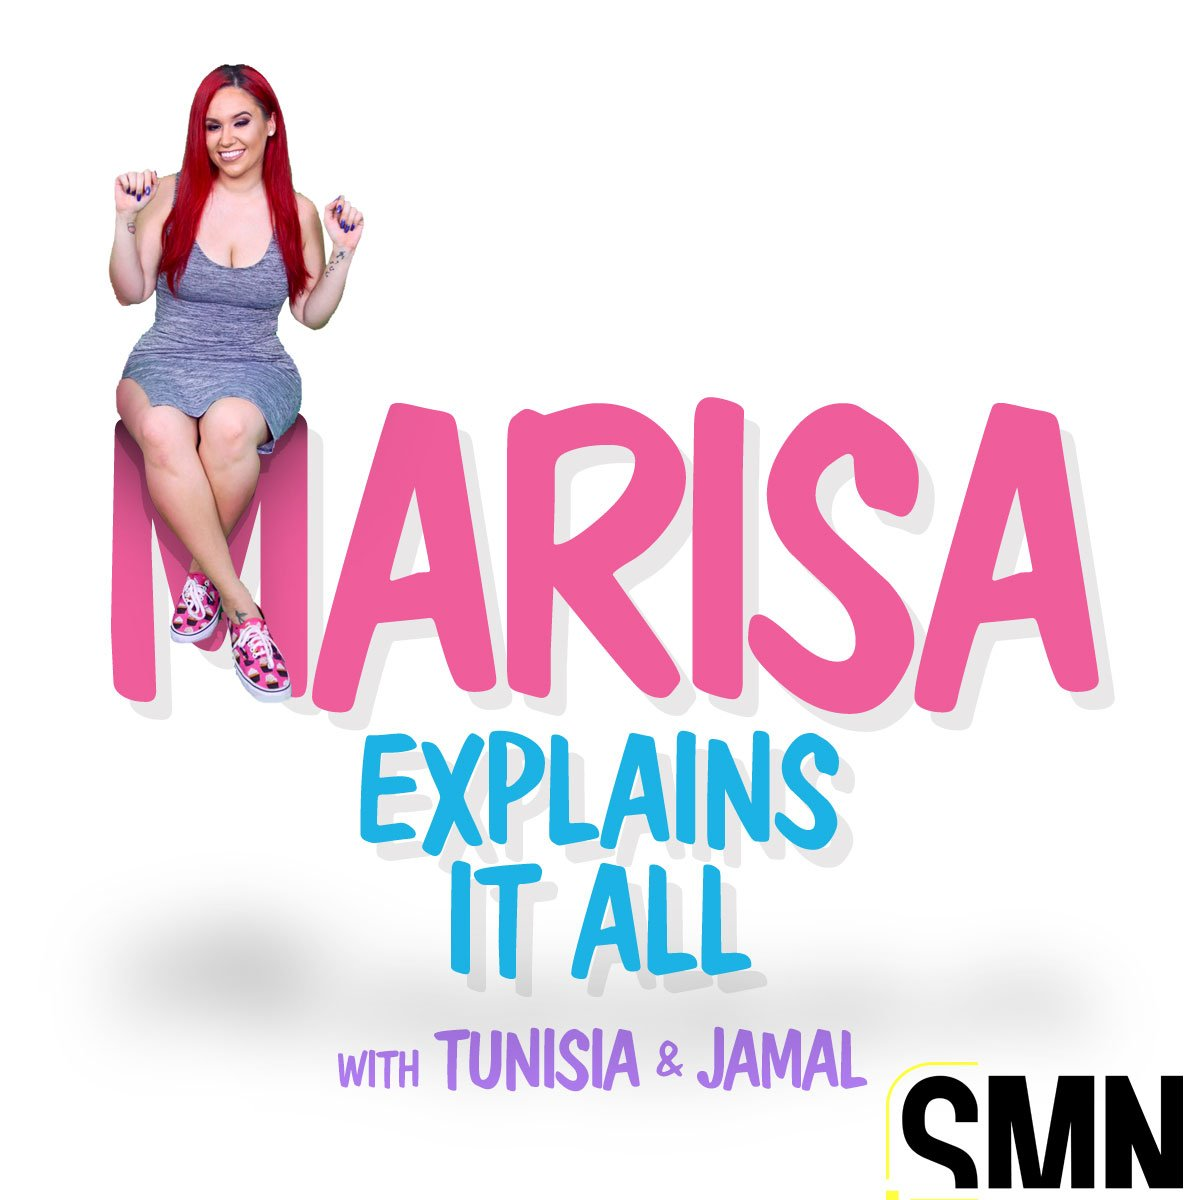 Podcast: Marisa Mendez, Jamal, & Tunisia – Marisa Explains It All (Ep. 1)